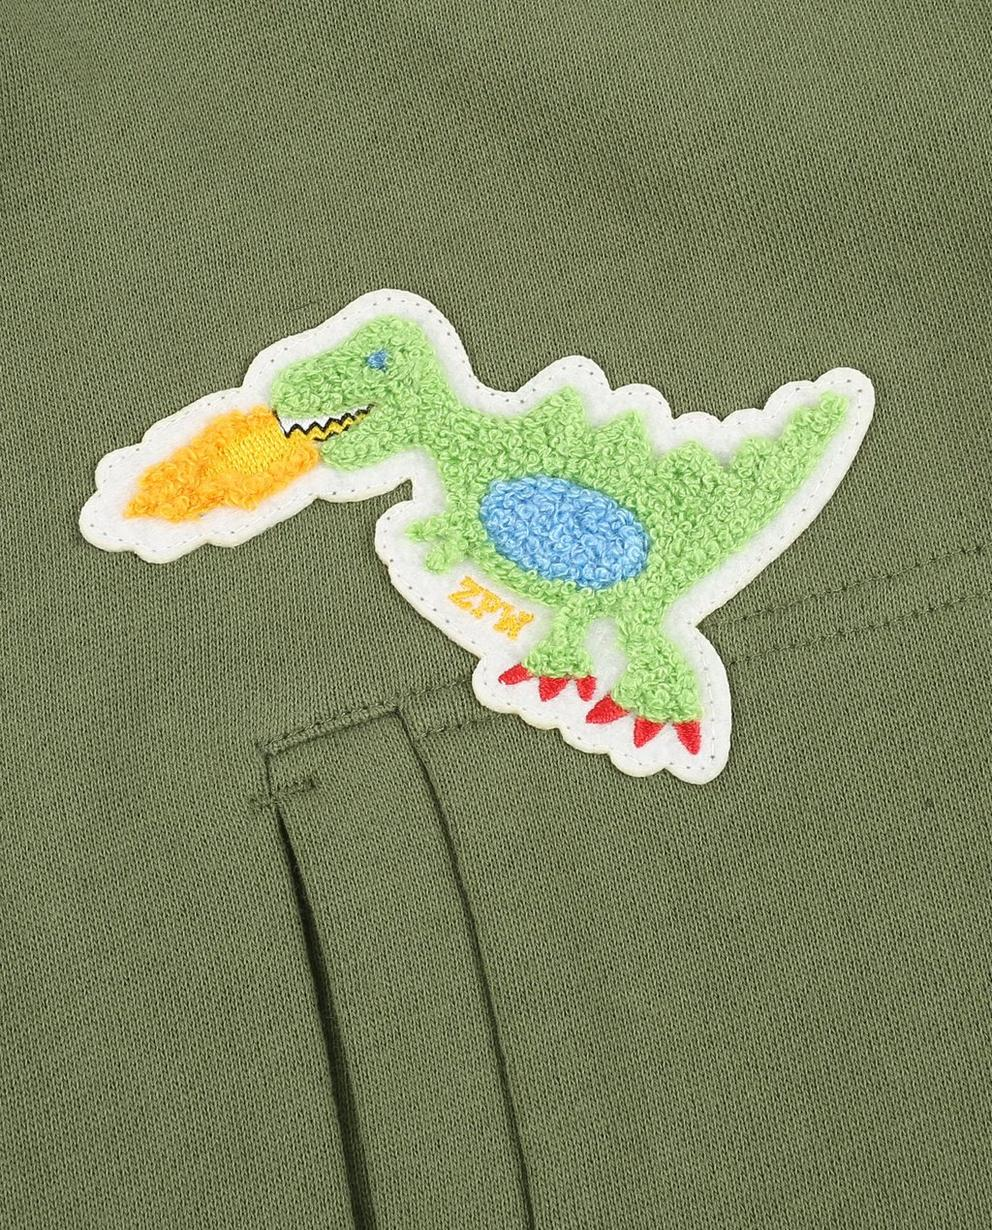 Cardigans - dark green - Kaki bombervest ZulupaPUWa - Unisex